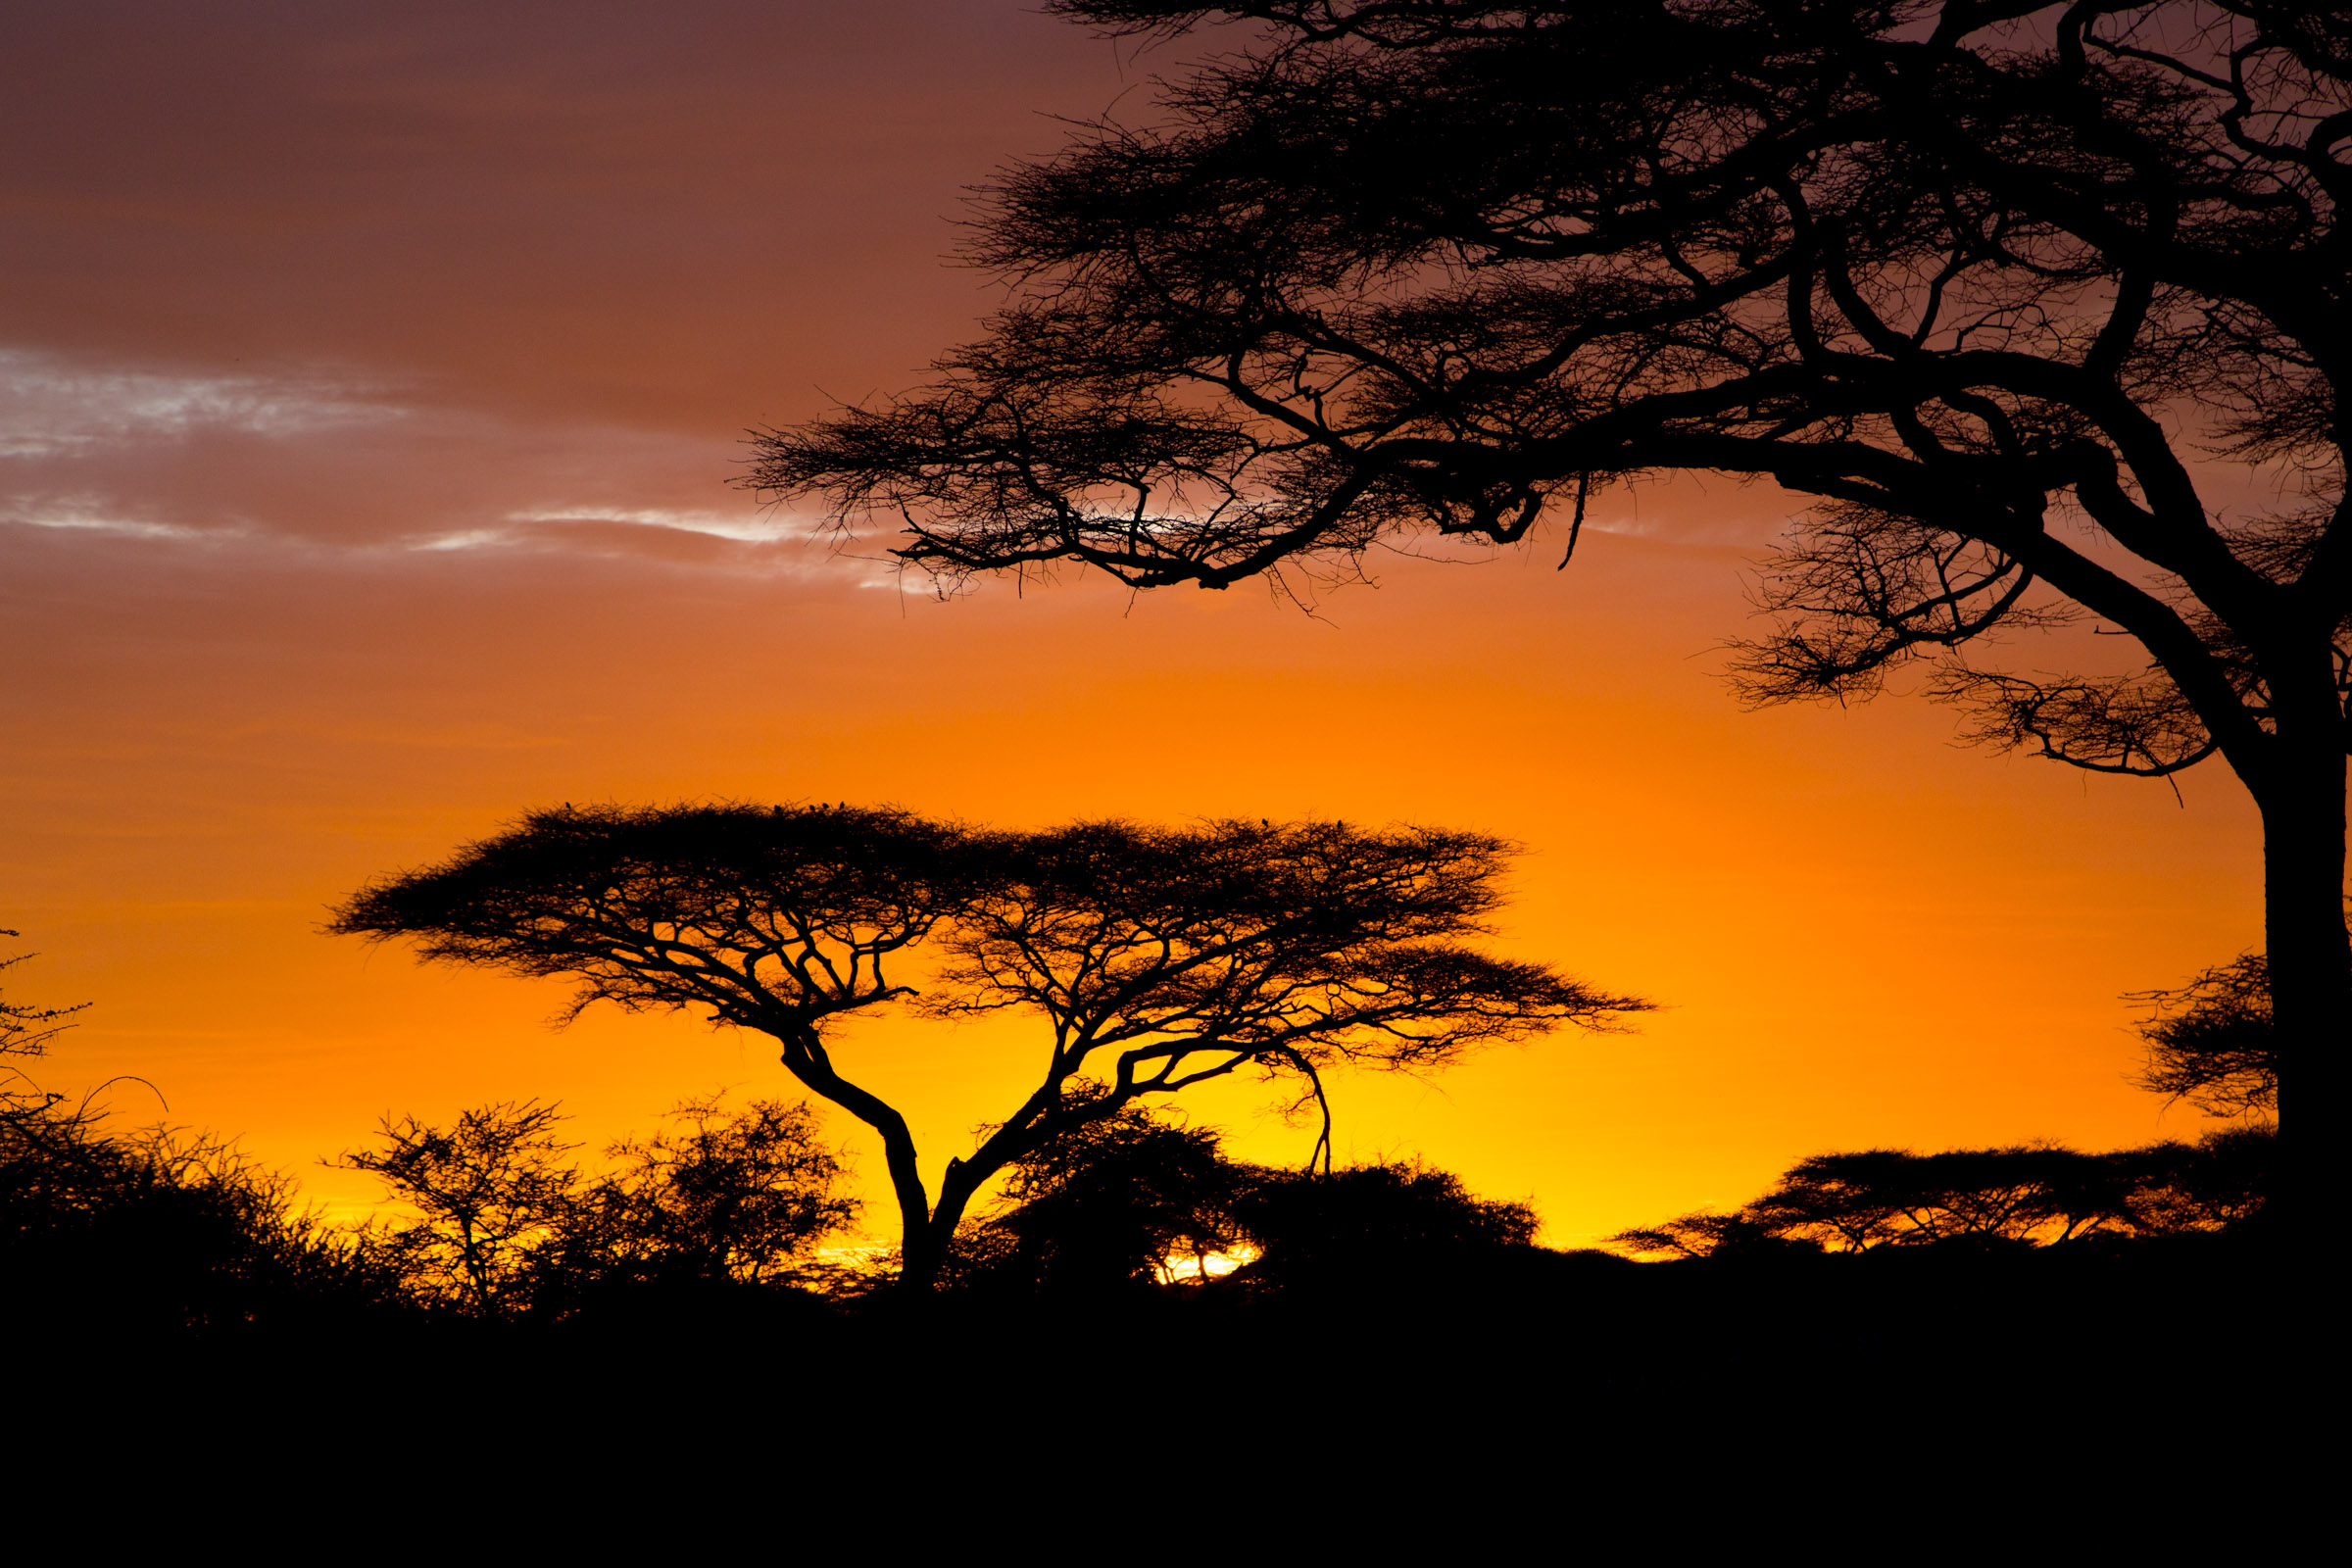 africa wallpaper,sky,nature,tree,sunset,natural landscape